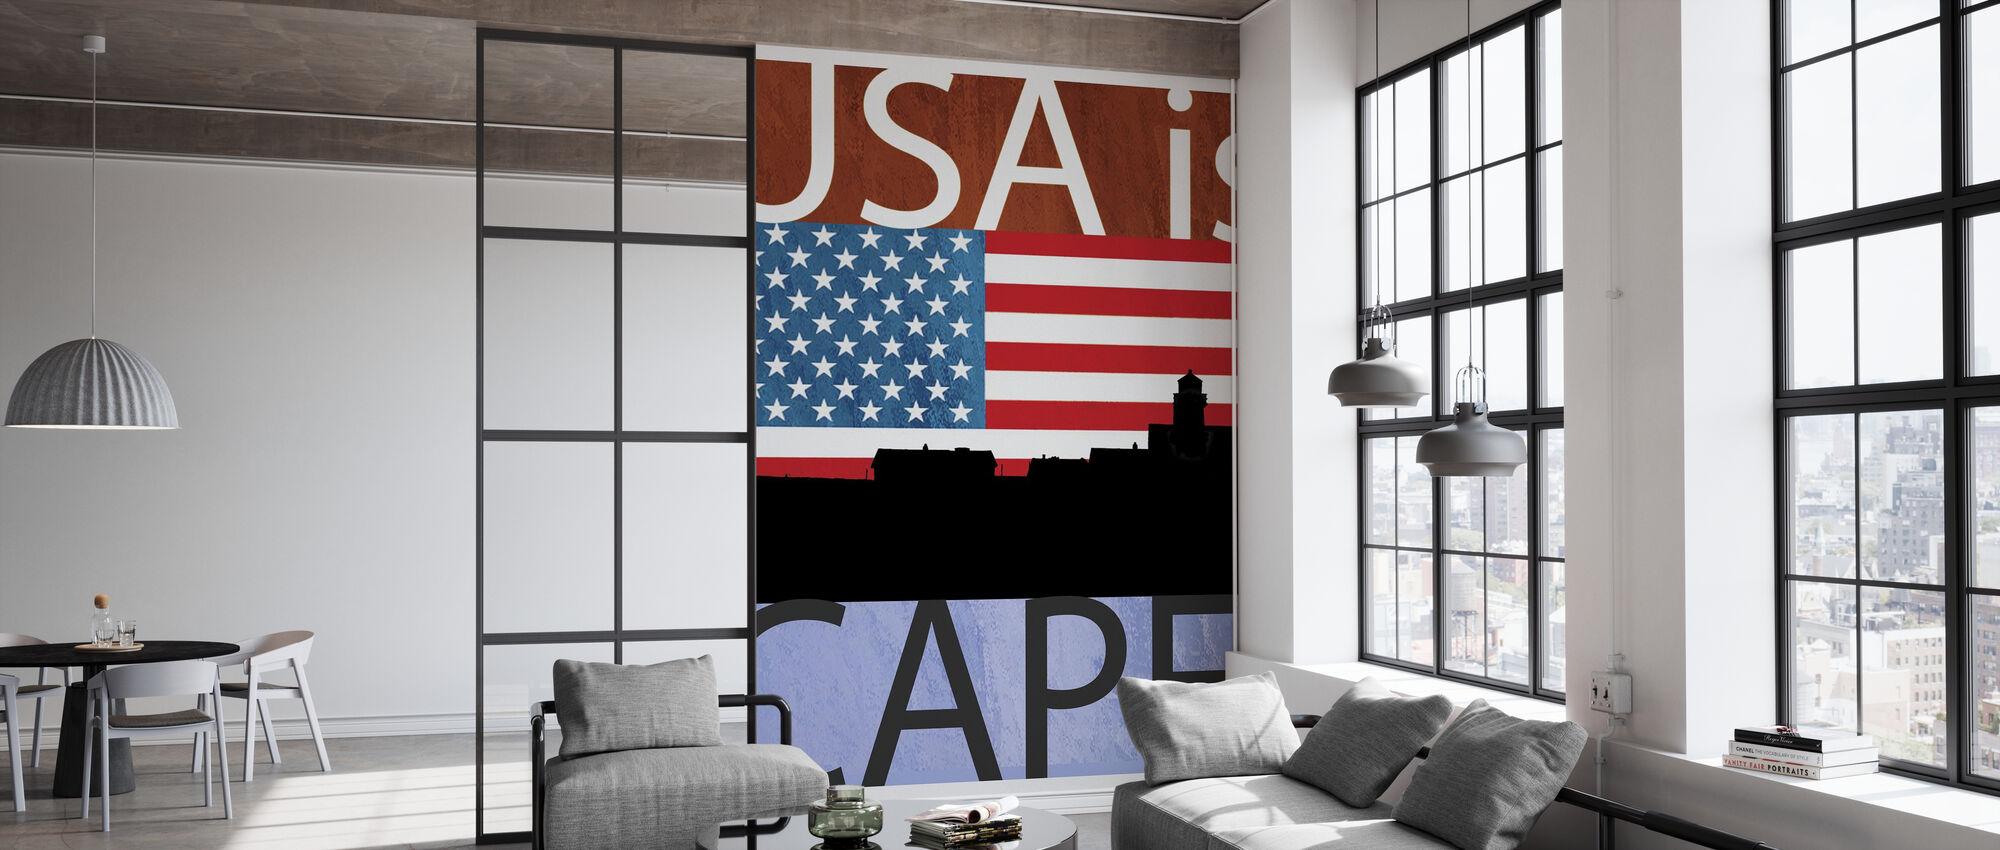 Cape Cod Art - Wallpaper - Office